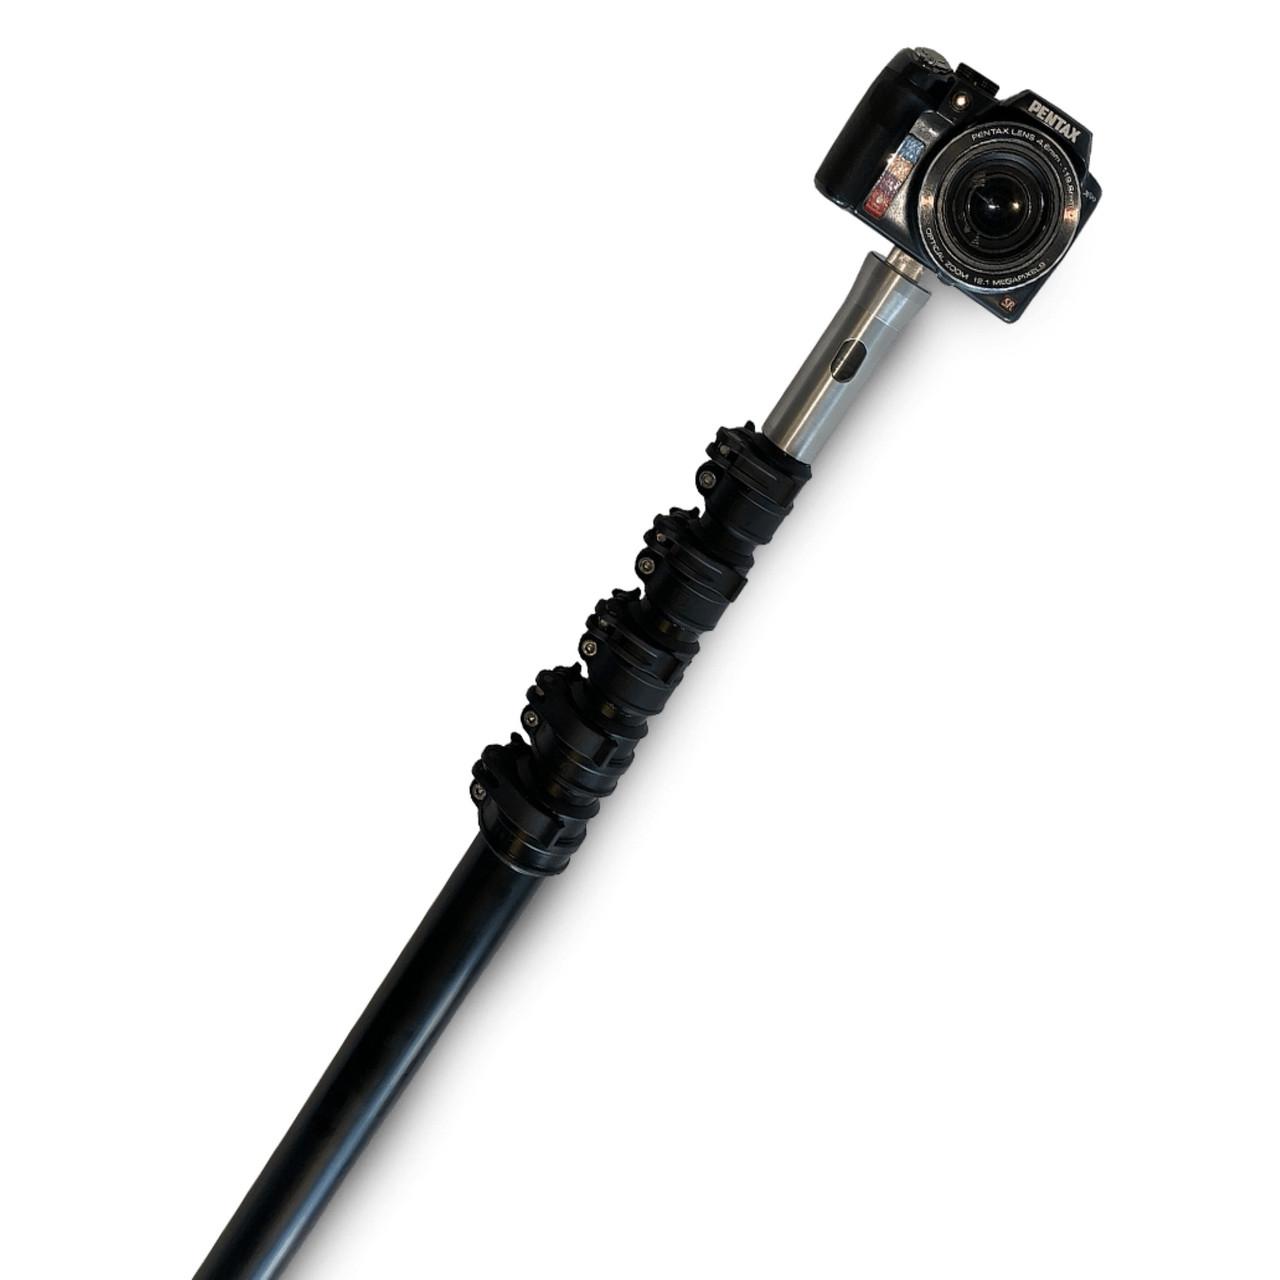 36ft Carbon Fibre Telescopic Monopod Camera Pole